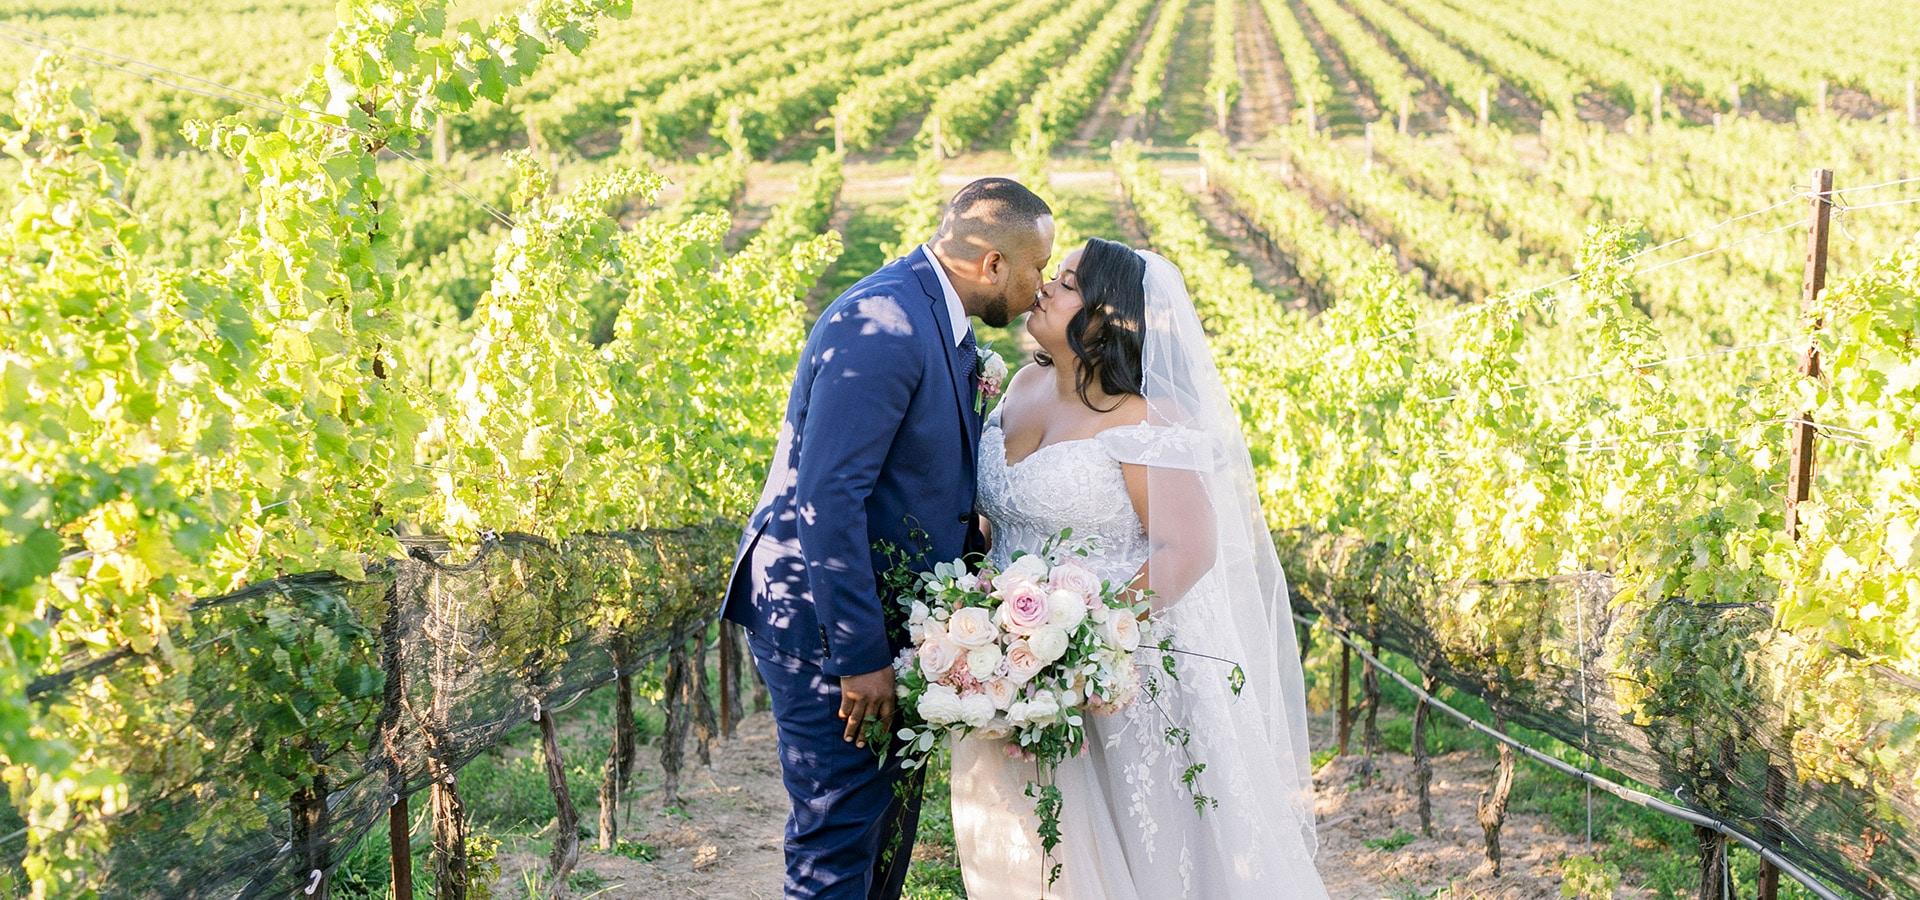 Hero image for Stephanie and Kemar's Vineyard Wedding at Ravine Vineyard